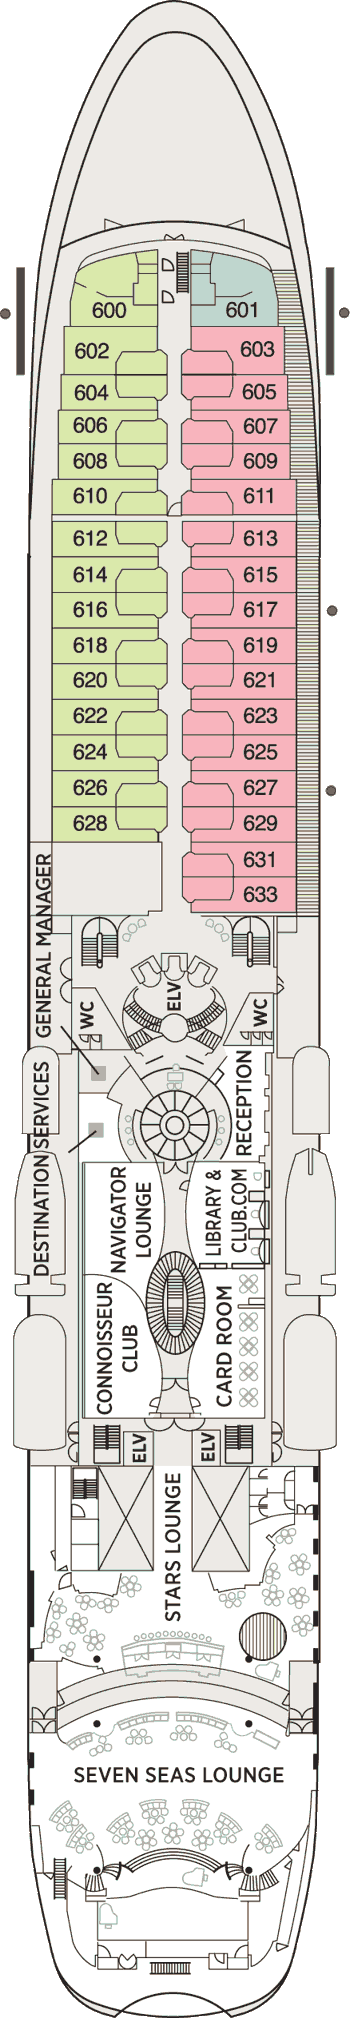 Seven Seas Navigator - Deck 6